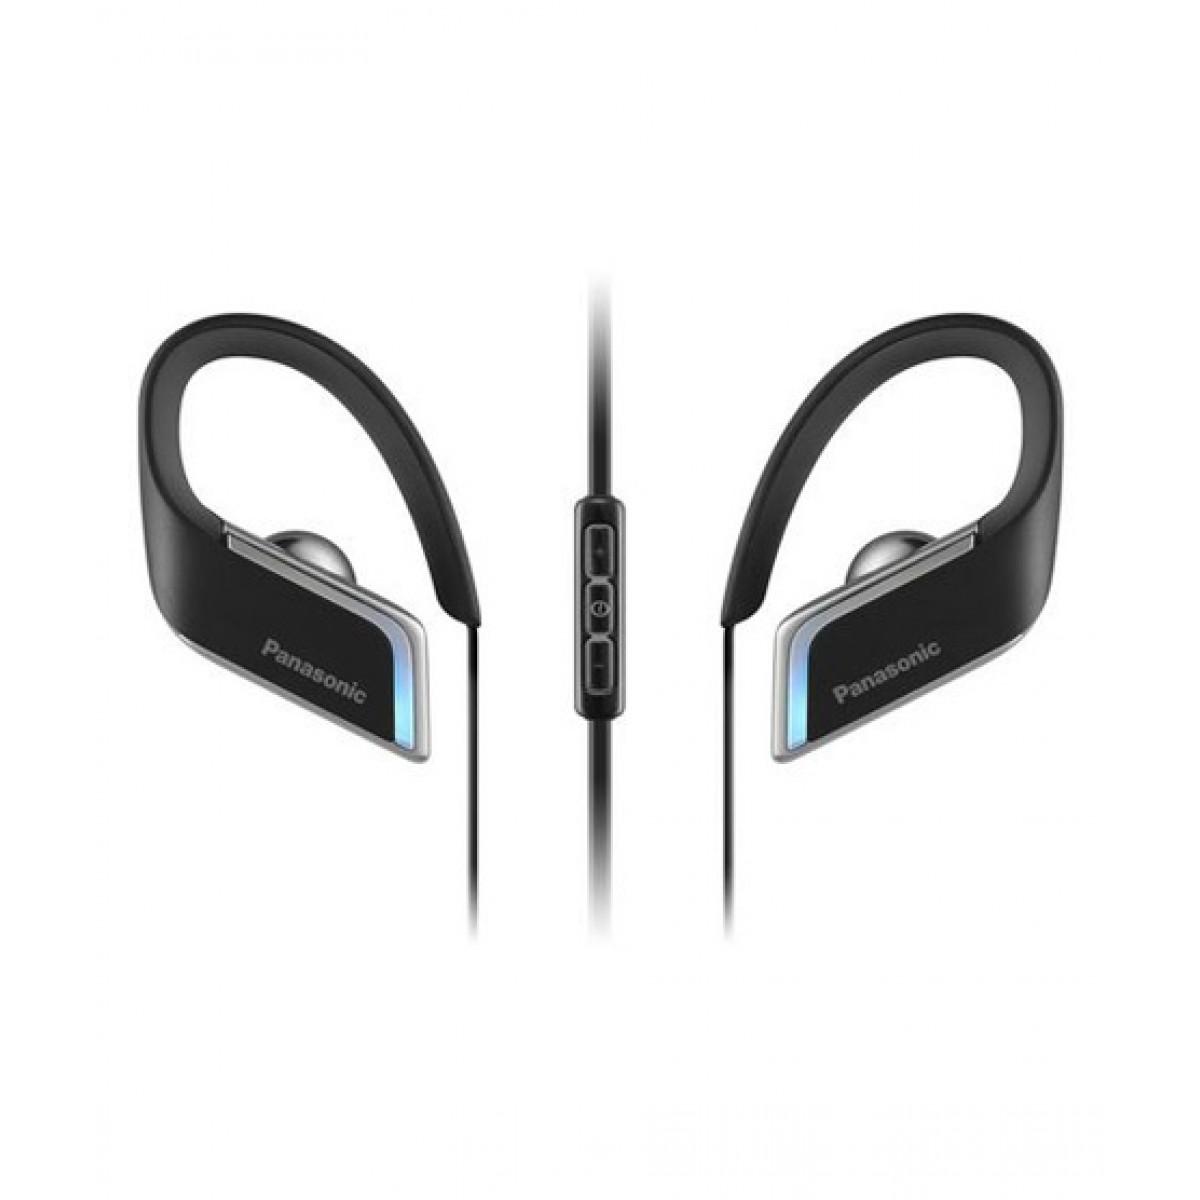 Panasonic Wings Wireless Bluetooth Sport Earbuds Black (RP-BTS50-K)